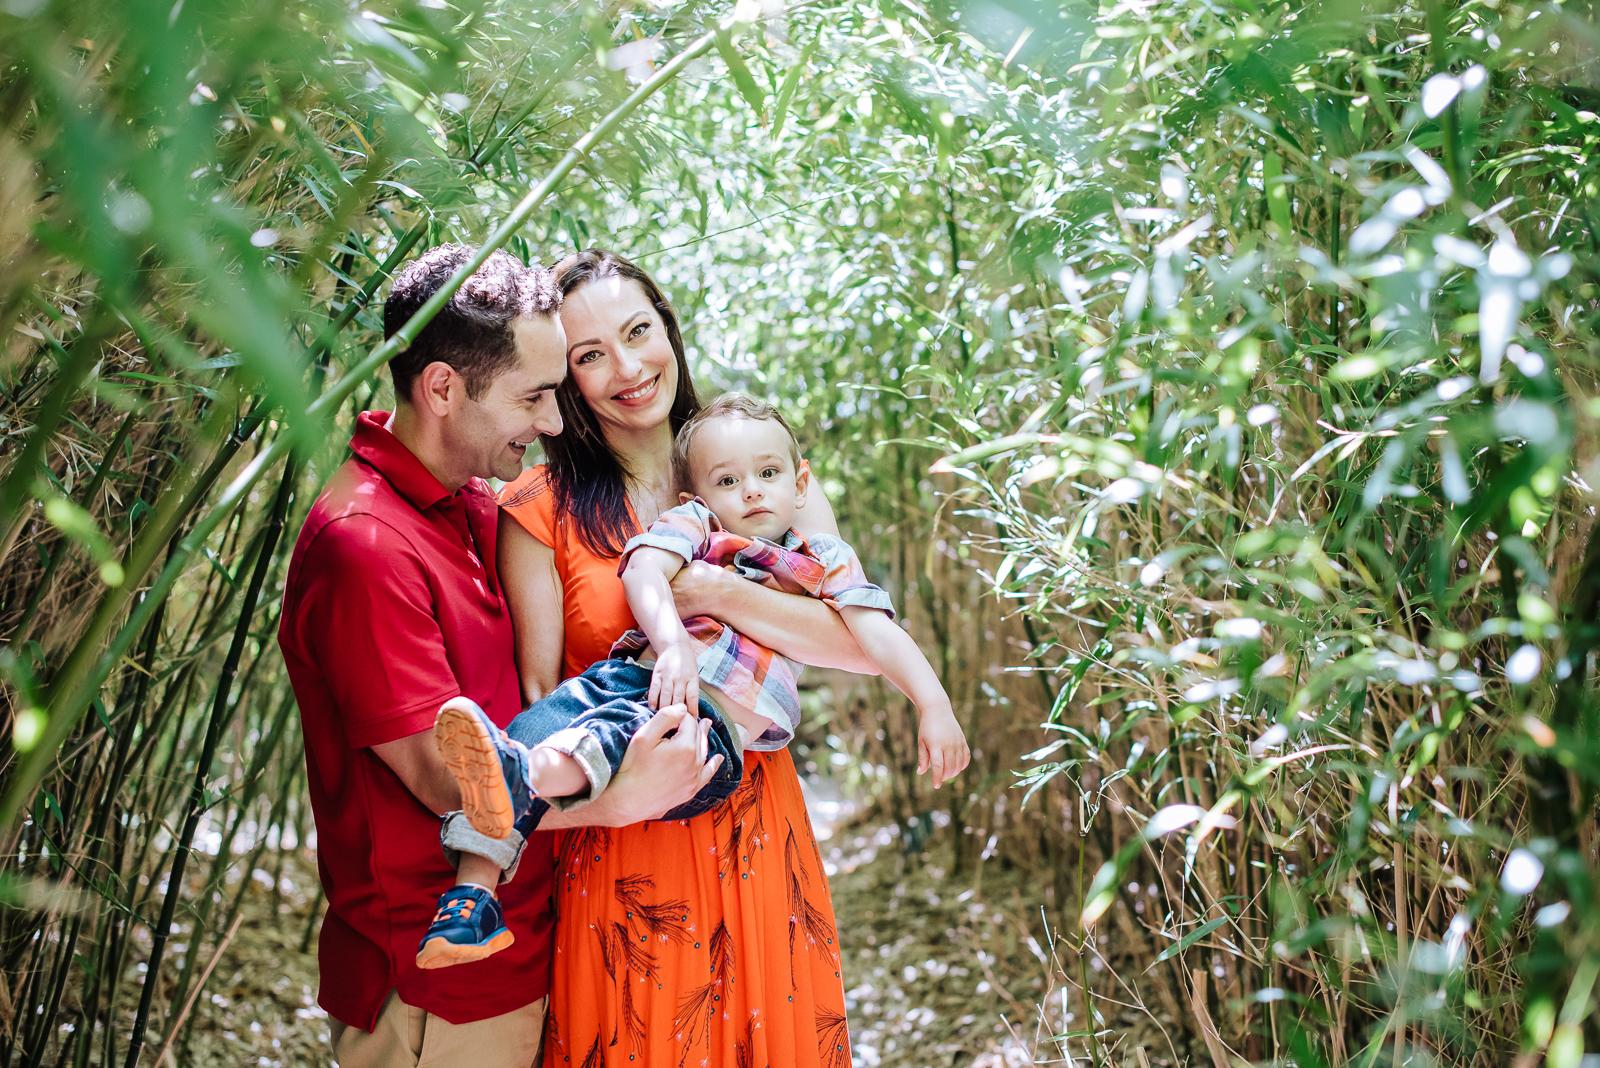 The Spraco Family | A Botanic Family Photo Session – FOCUS